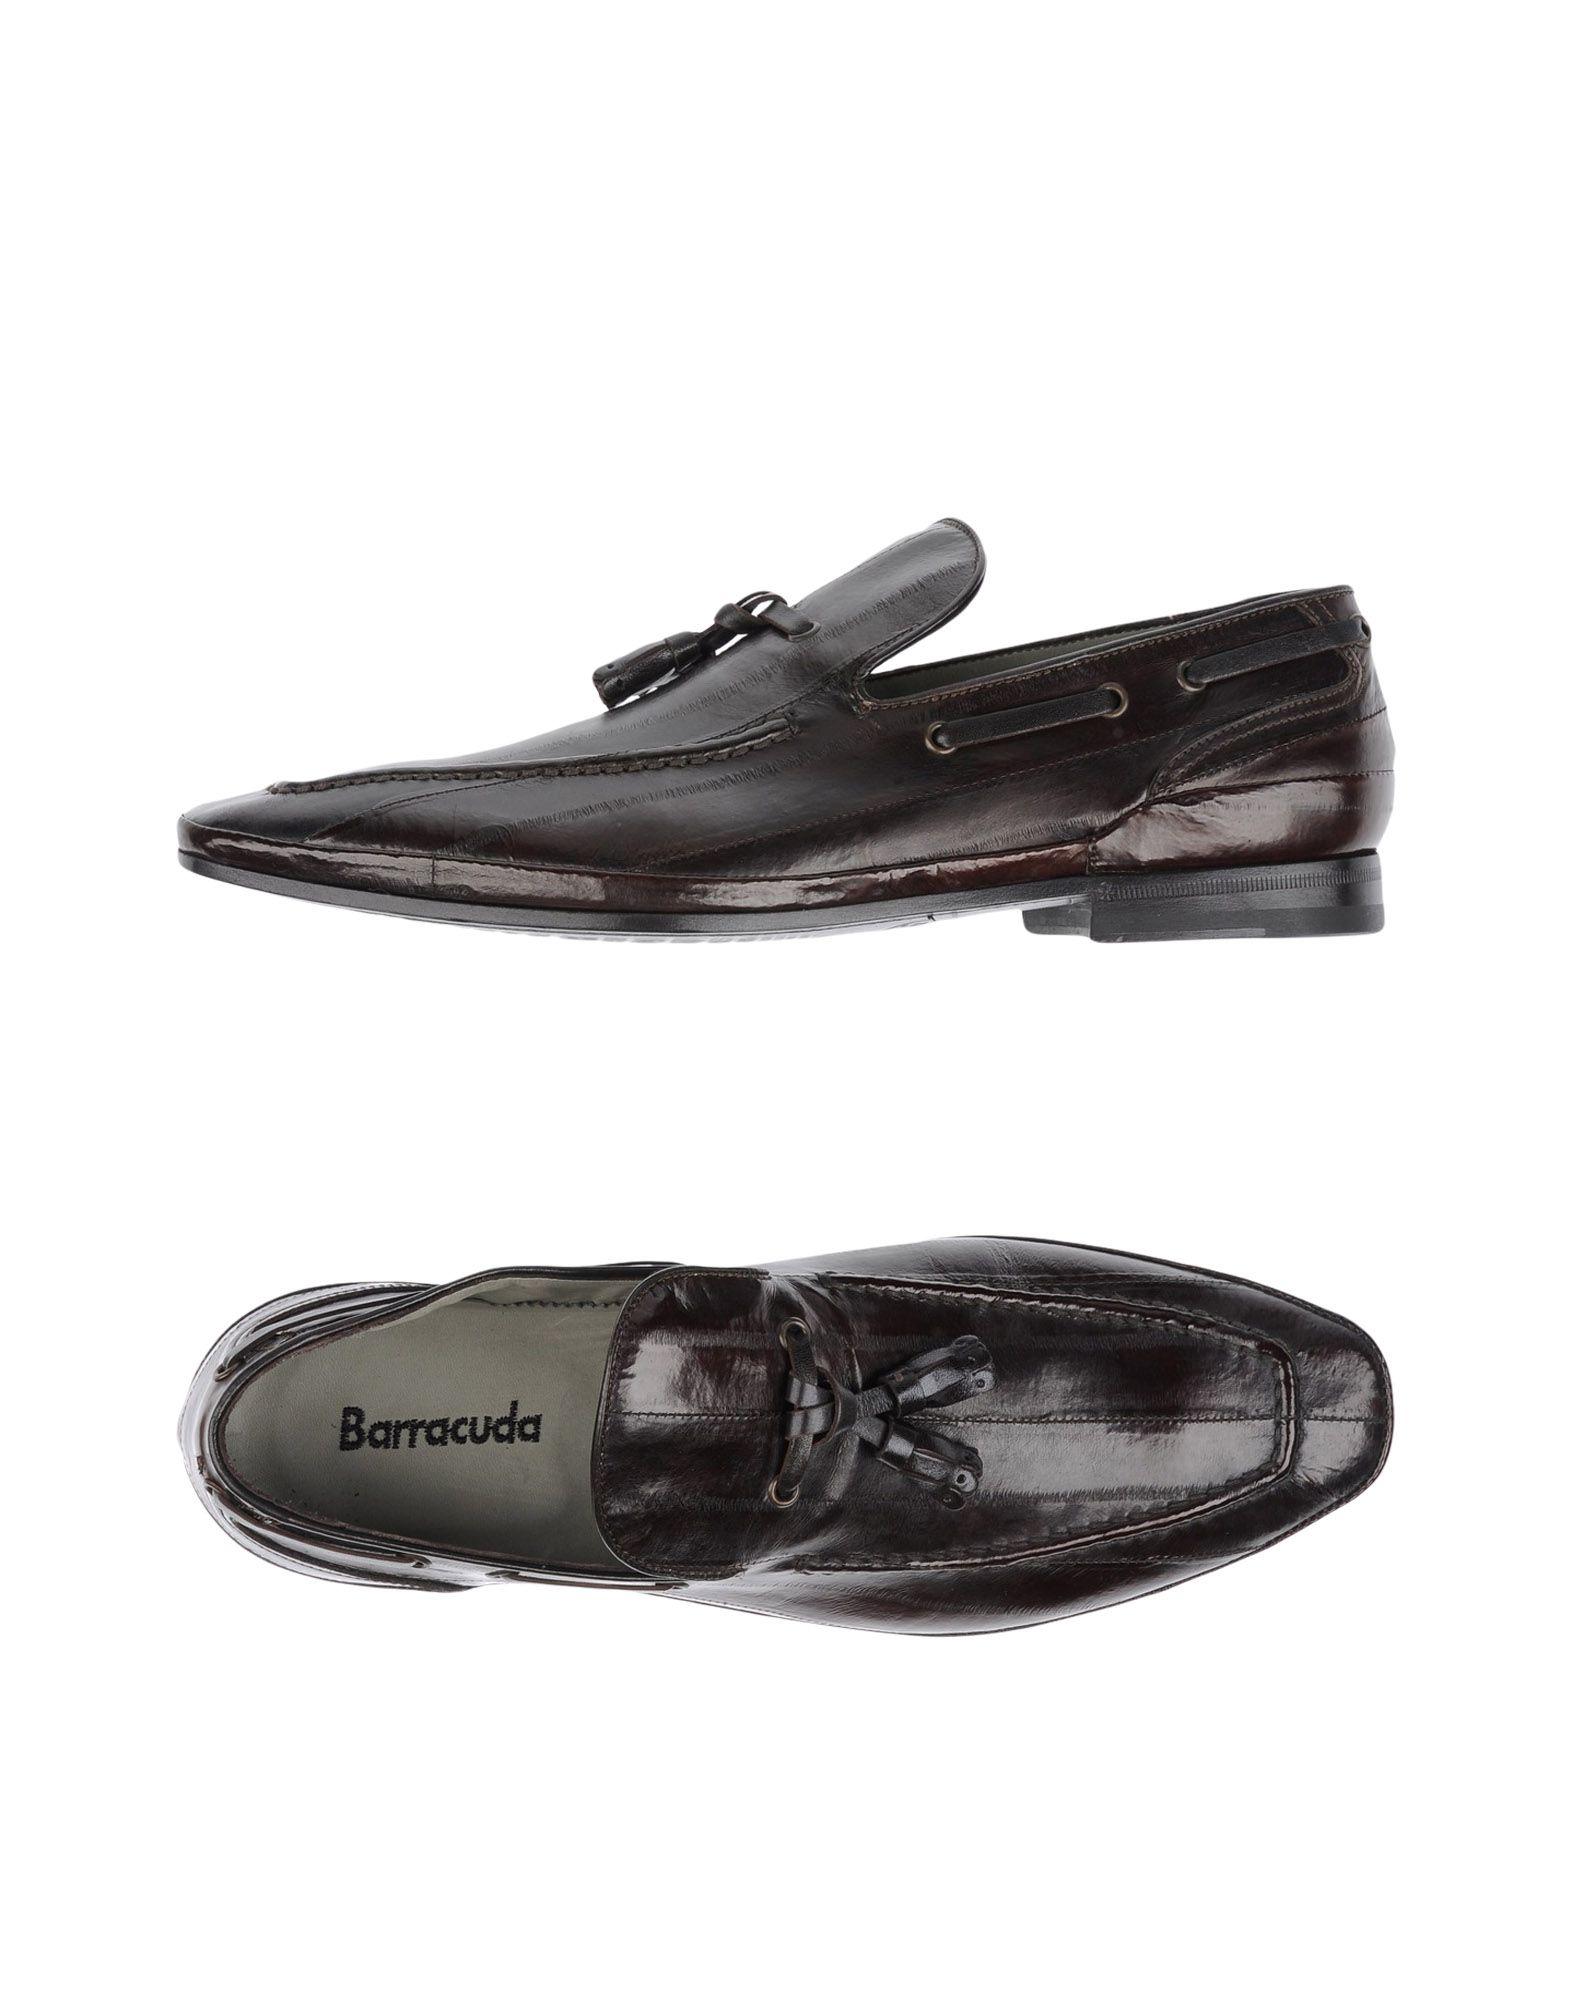 Barracuda Mokassins Herren Heiße  11243228SM Heiße Herren Schuhe 0616d5